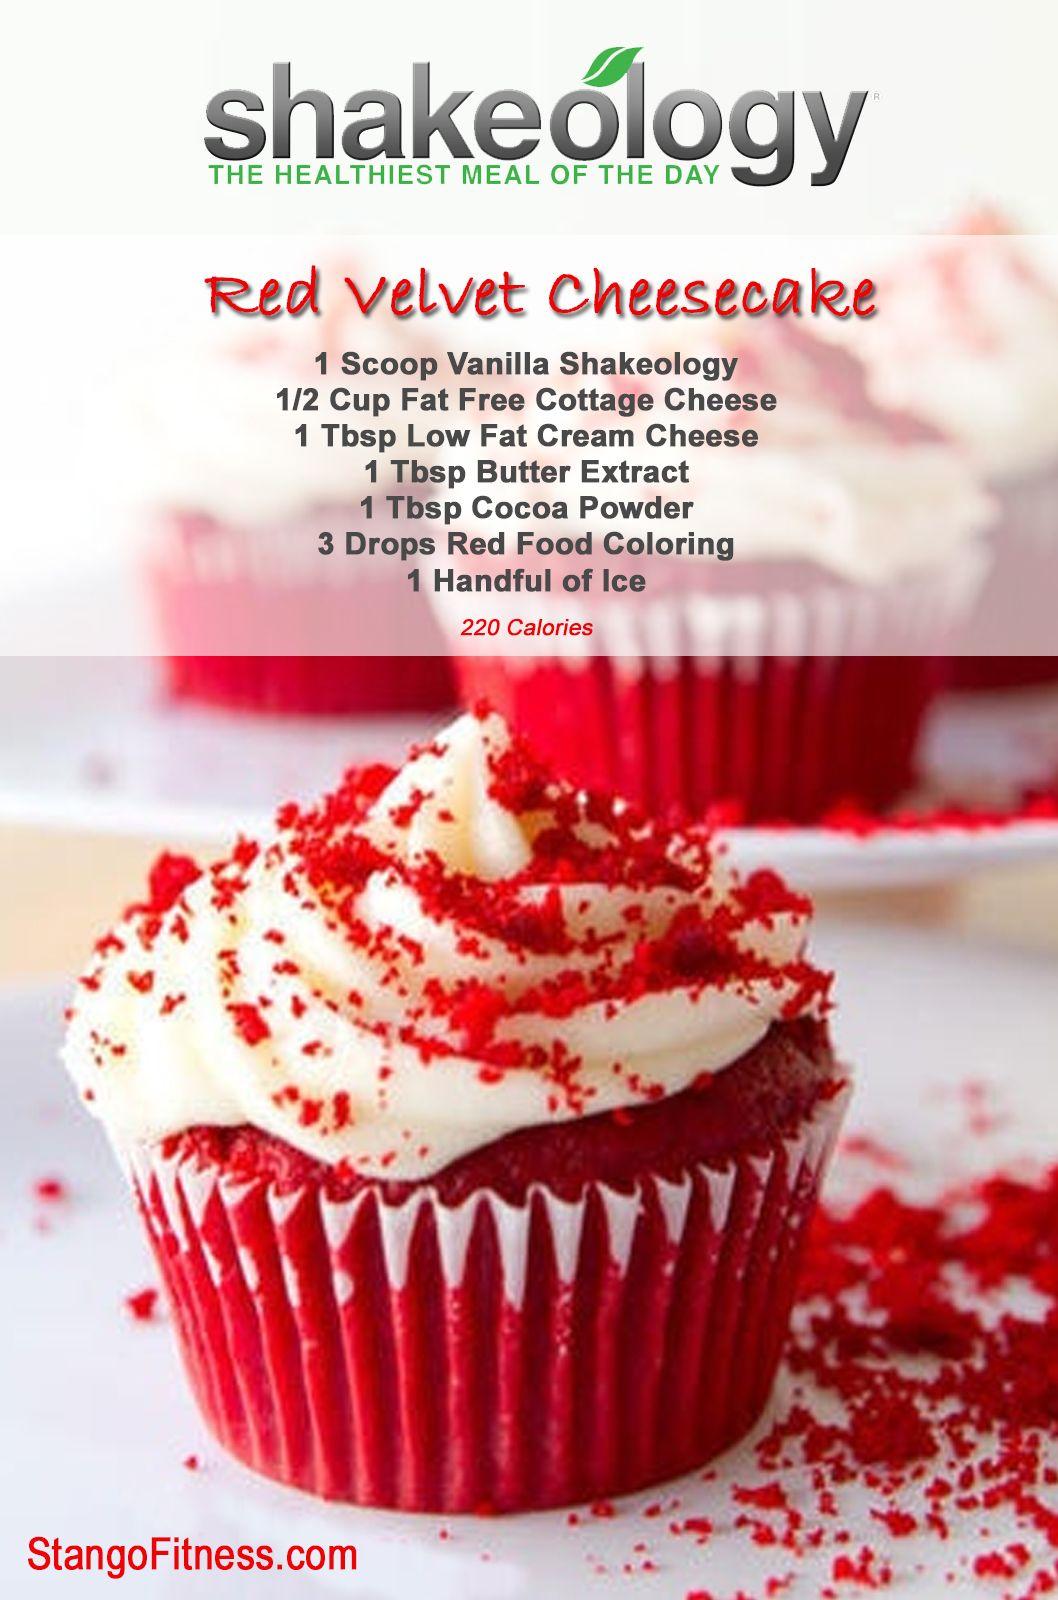 Red Velvet Cheesecake Jeff Create This One Himself